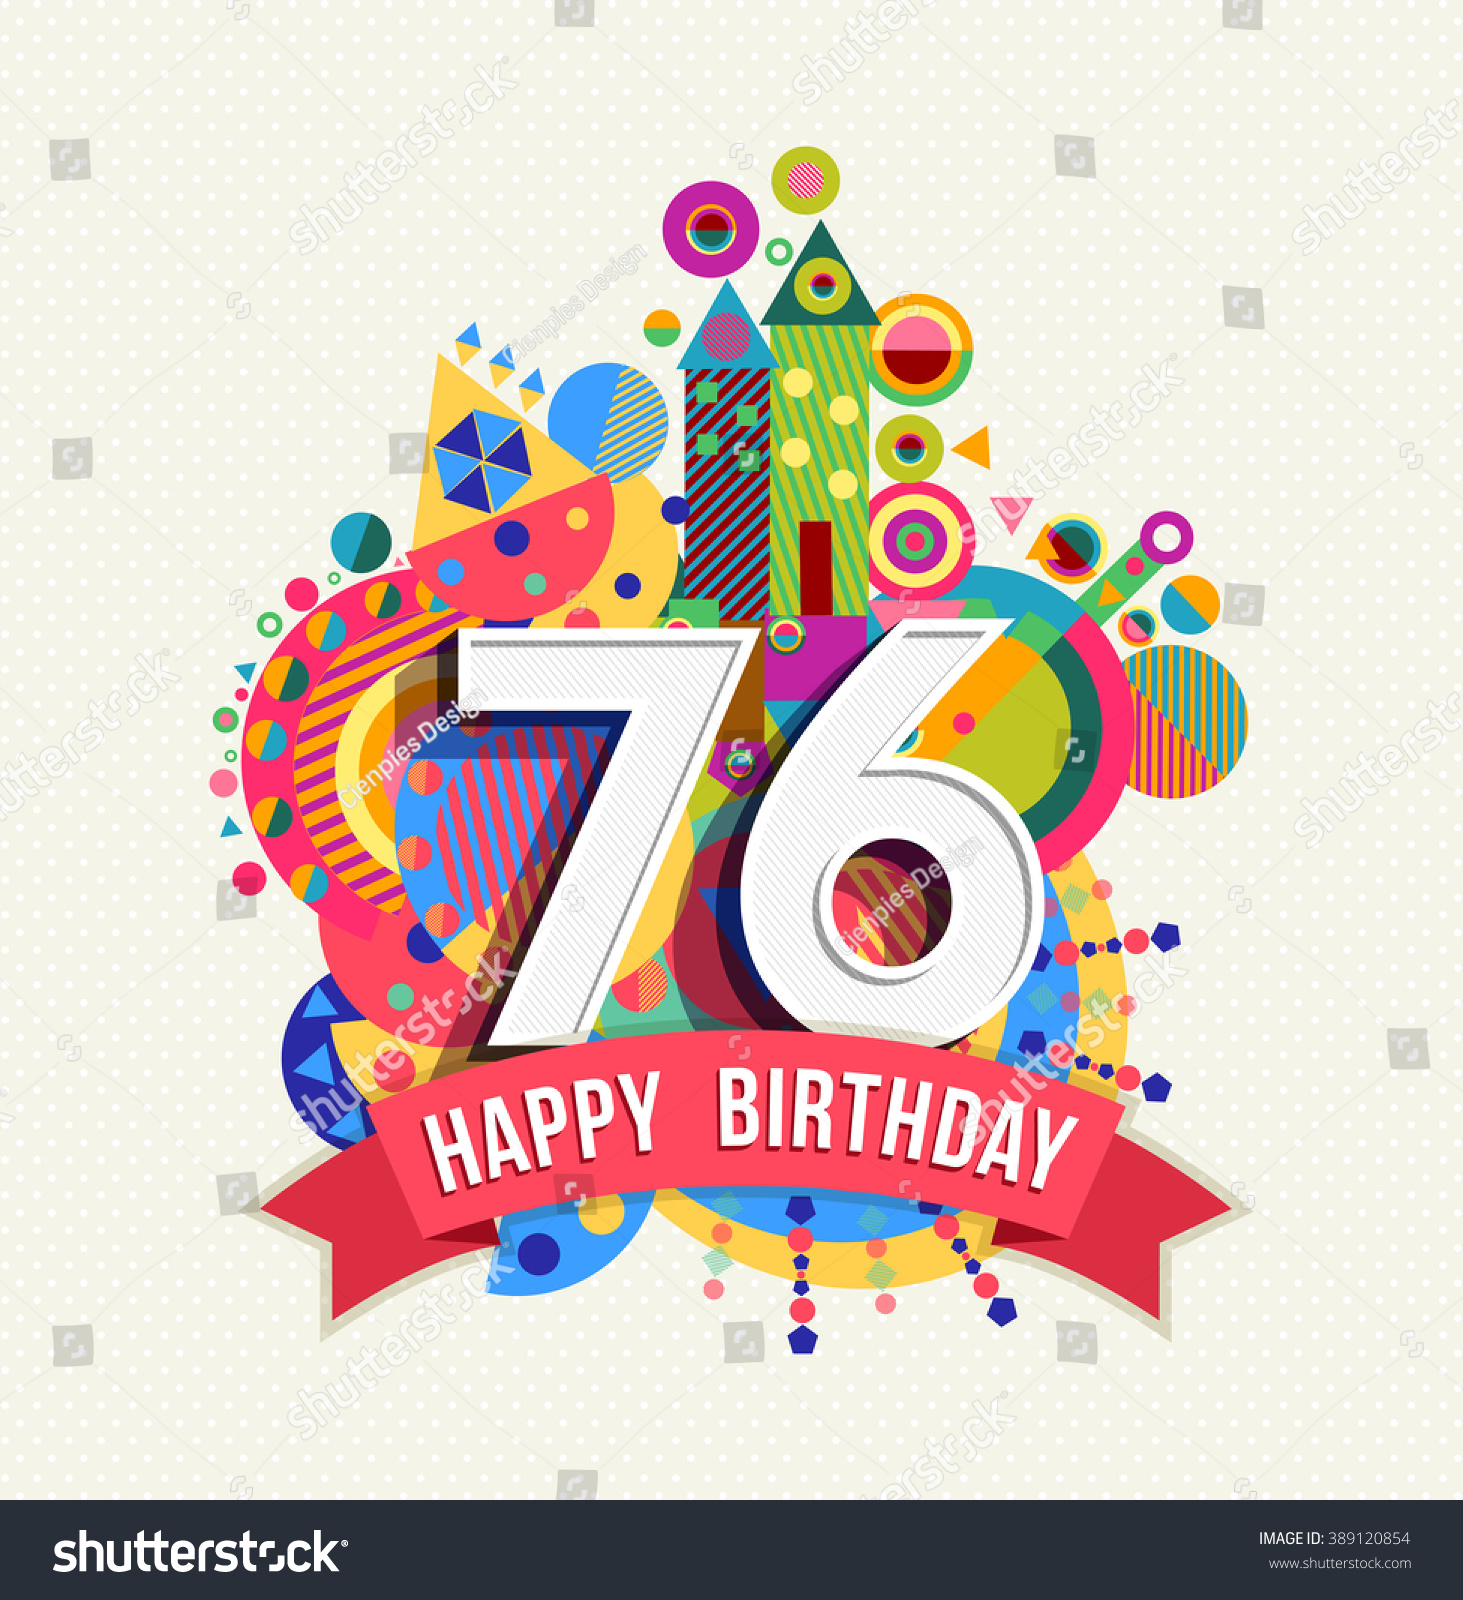 Happy Birthday Seventy Six 76 Year Stock Vector 389120854 ...